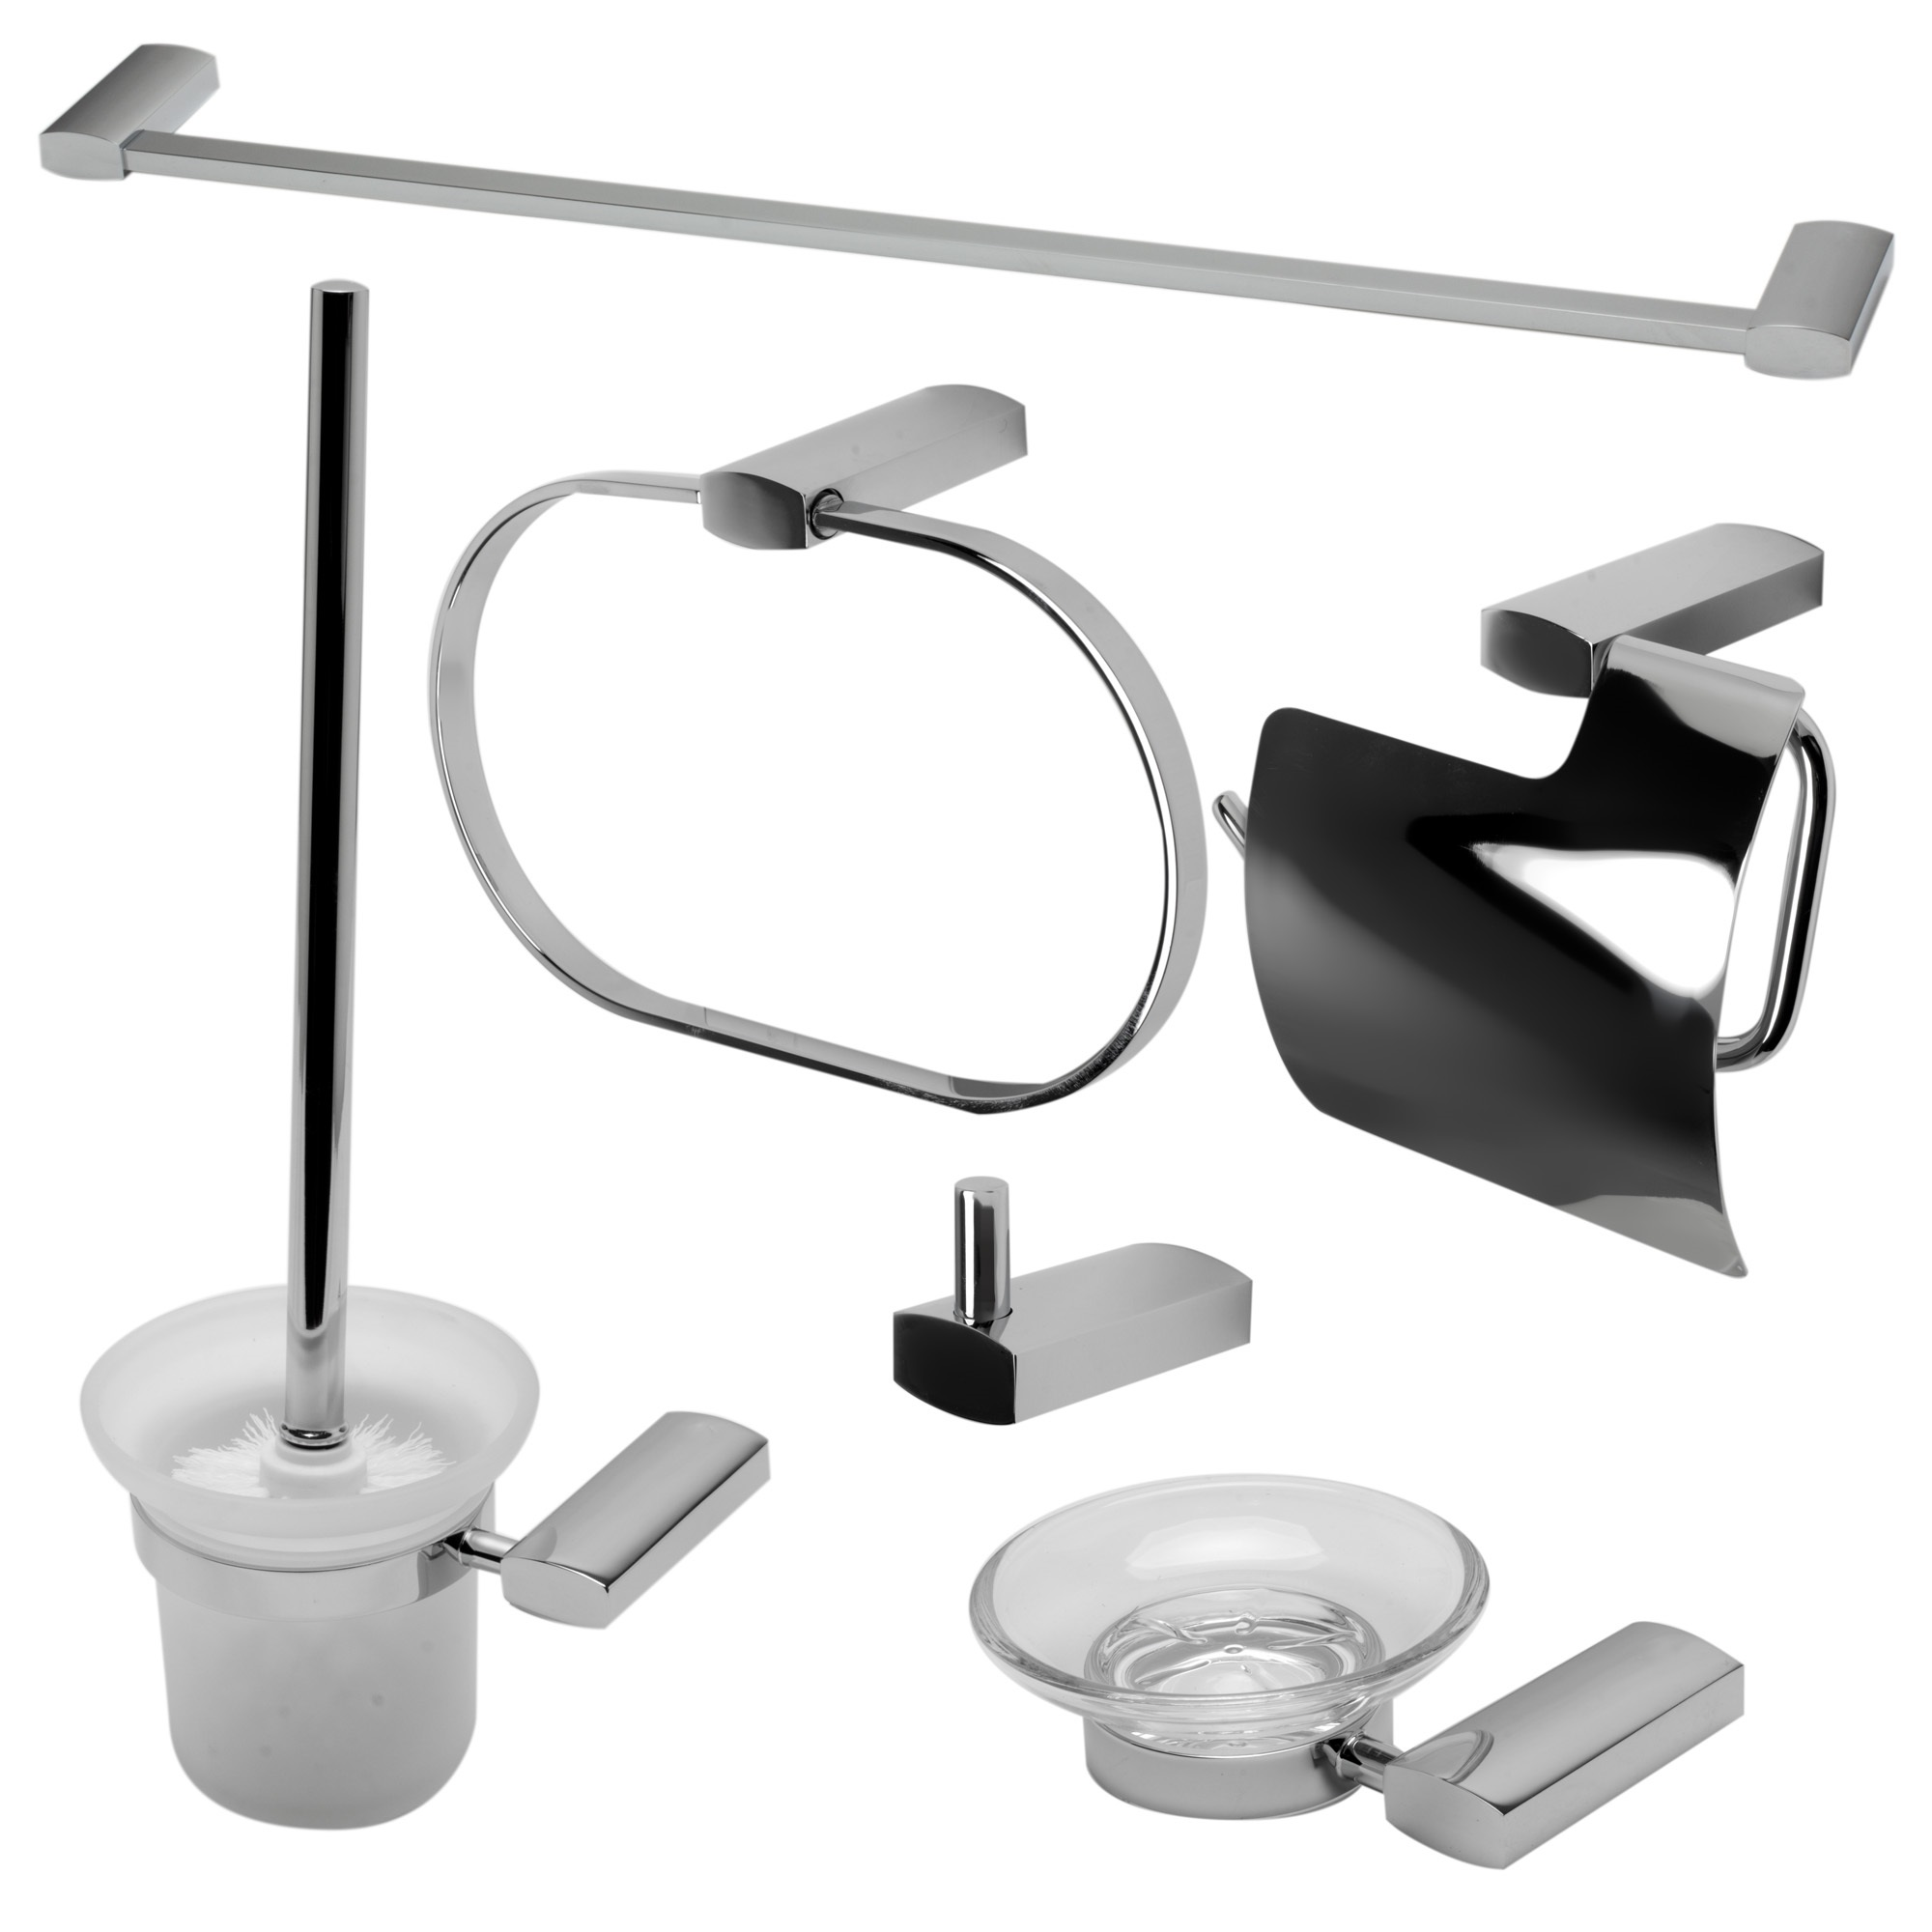 ALFI Brand AB9503-PC Polished Chrome Matching Bathroom Accessory Set, 6 Piece